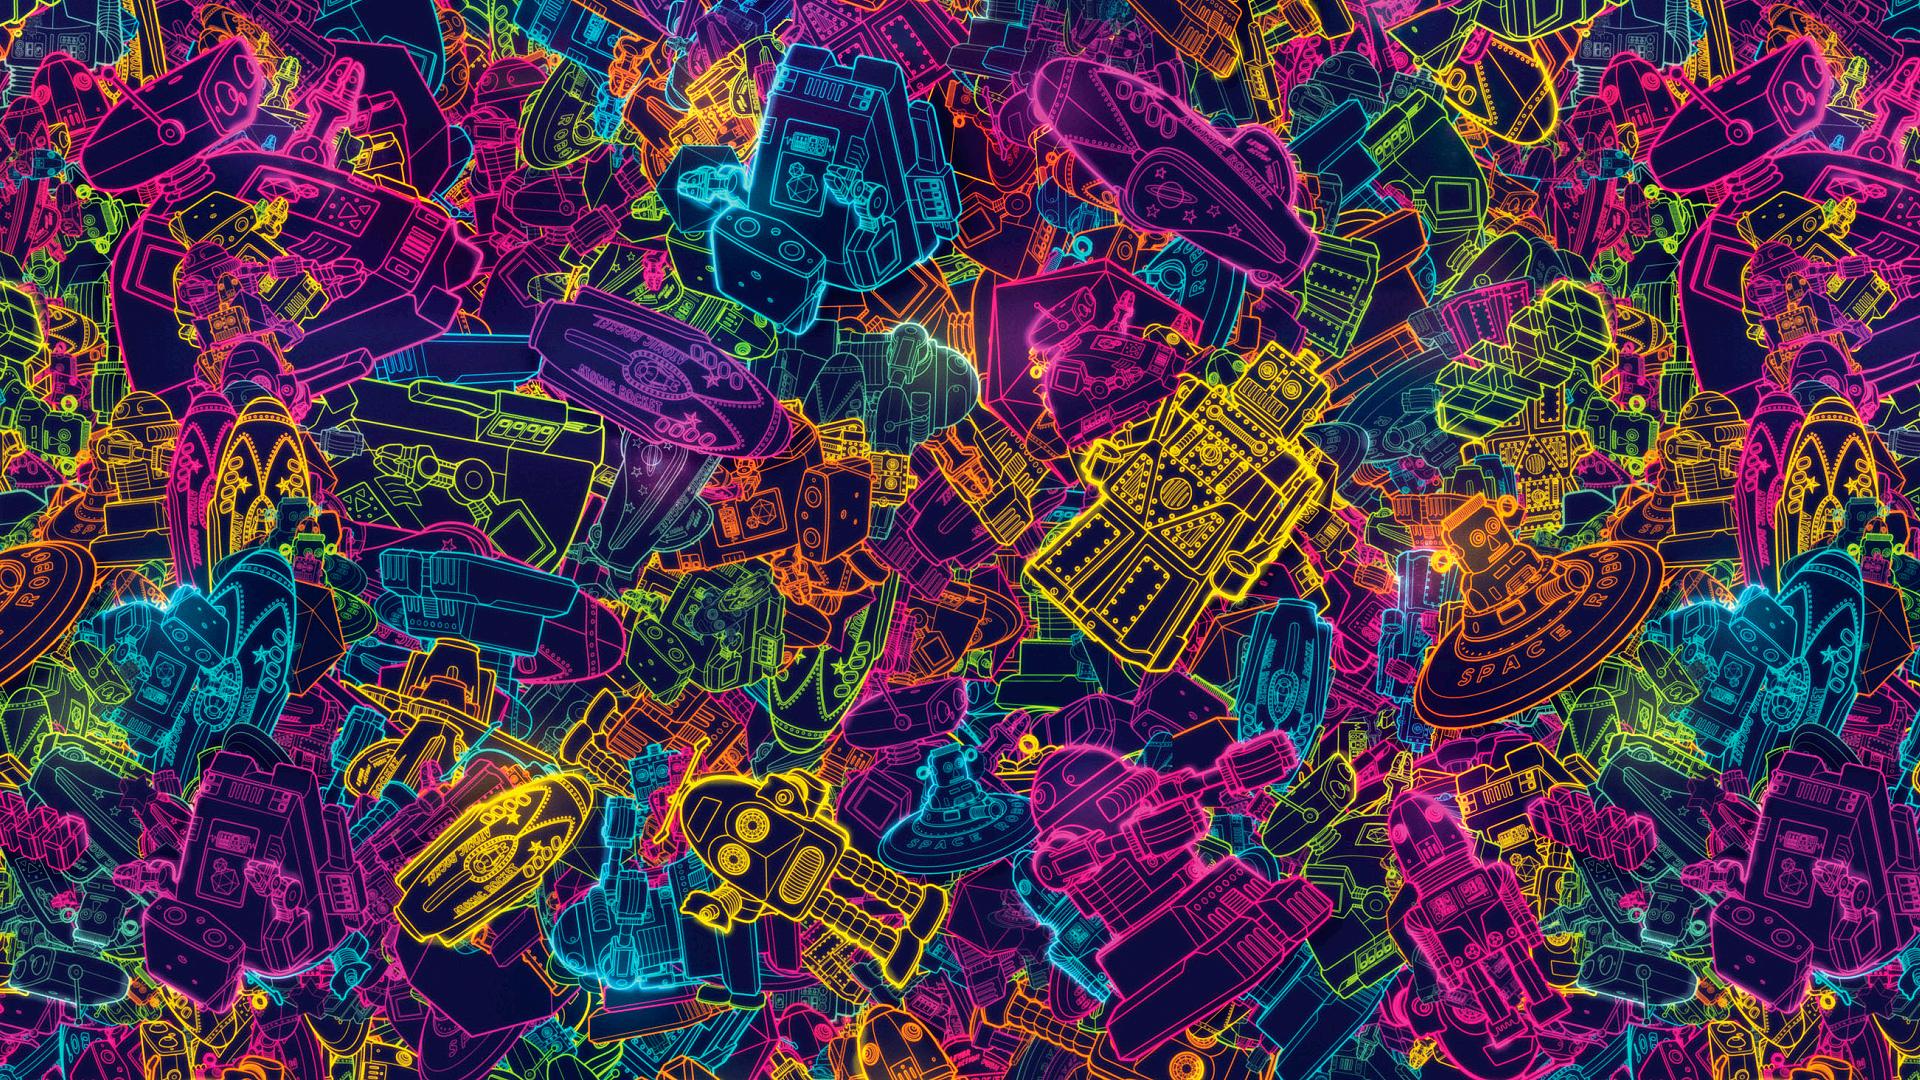 evangelion-colorful-robots-images-free_3758453.jpg